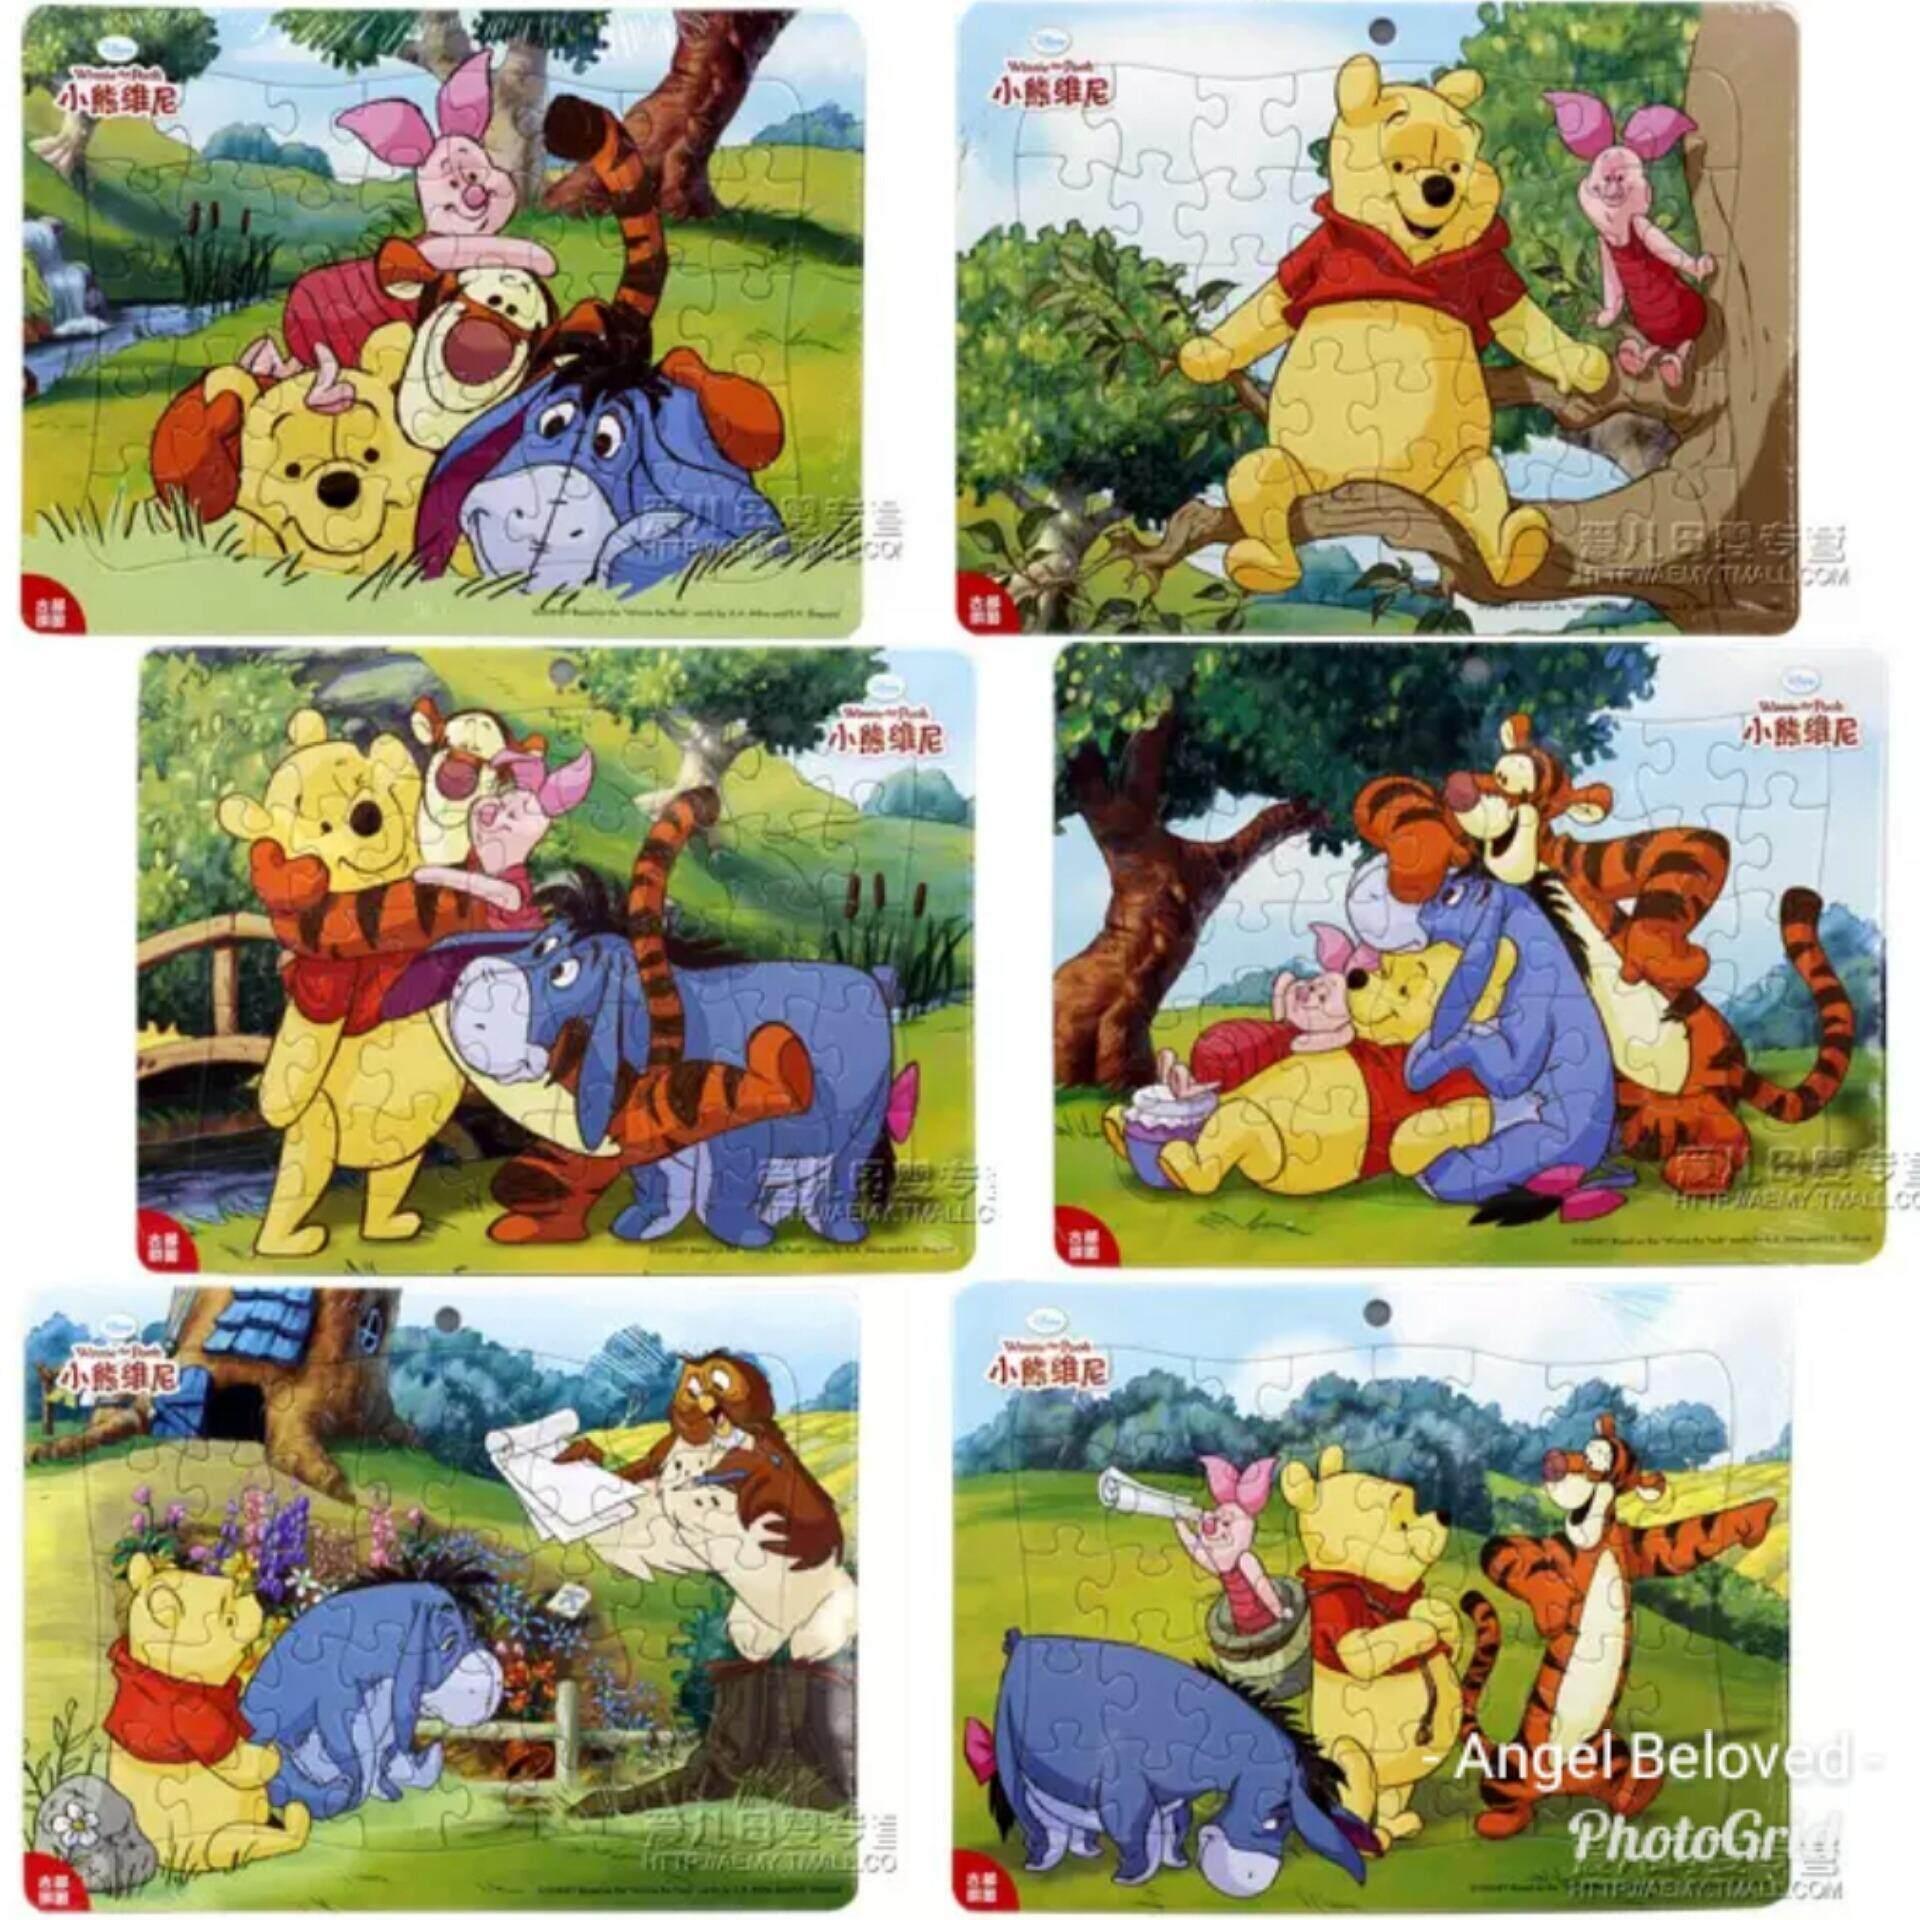 Selimut Vito Kids Sutra Panel 100x140 Cars Daftar Harga Terkini Submarine Rosanna Source 6 Pcs Jigsaw Puzzle For Winnie The Pooh